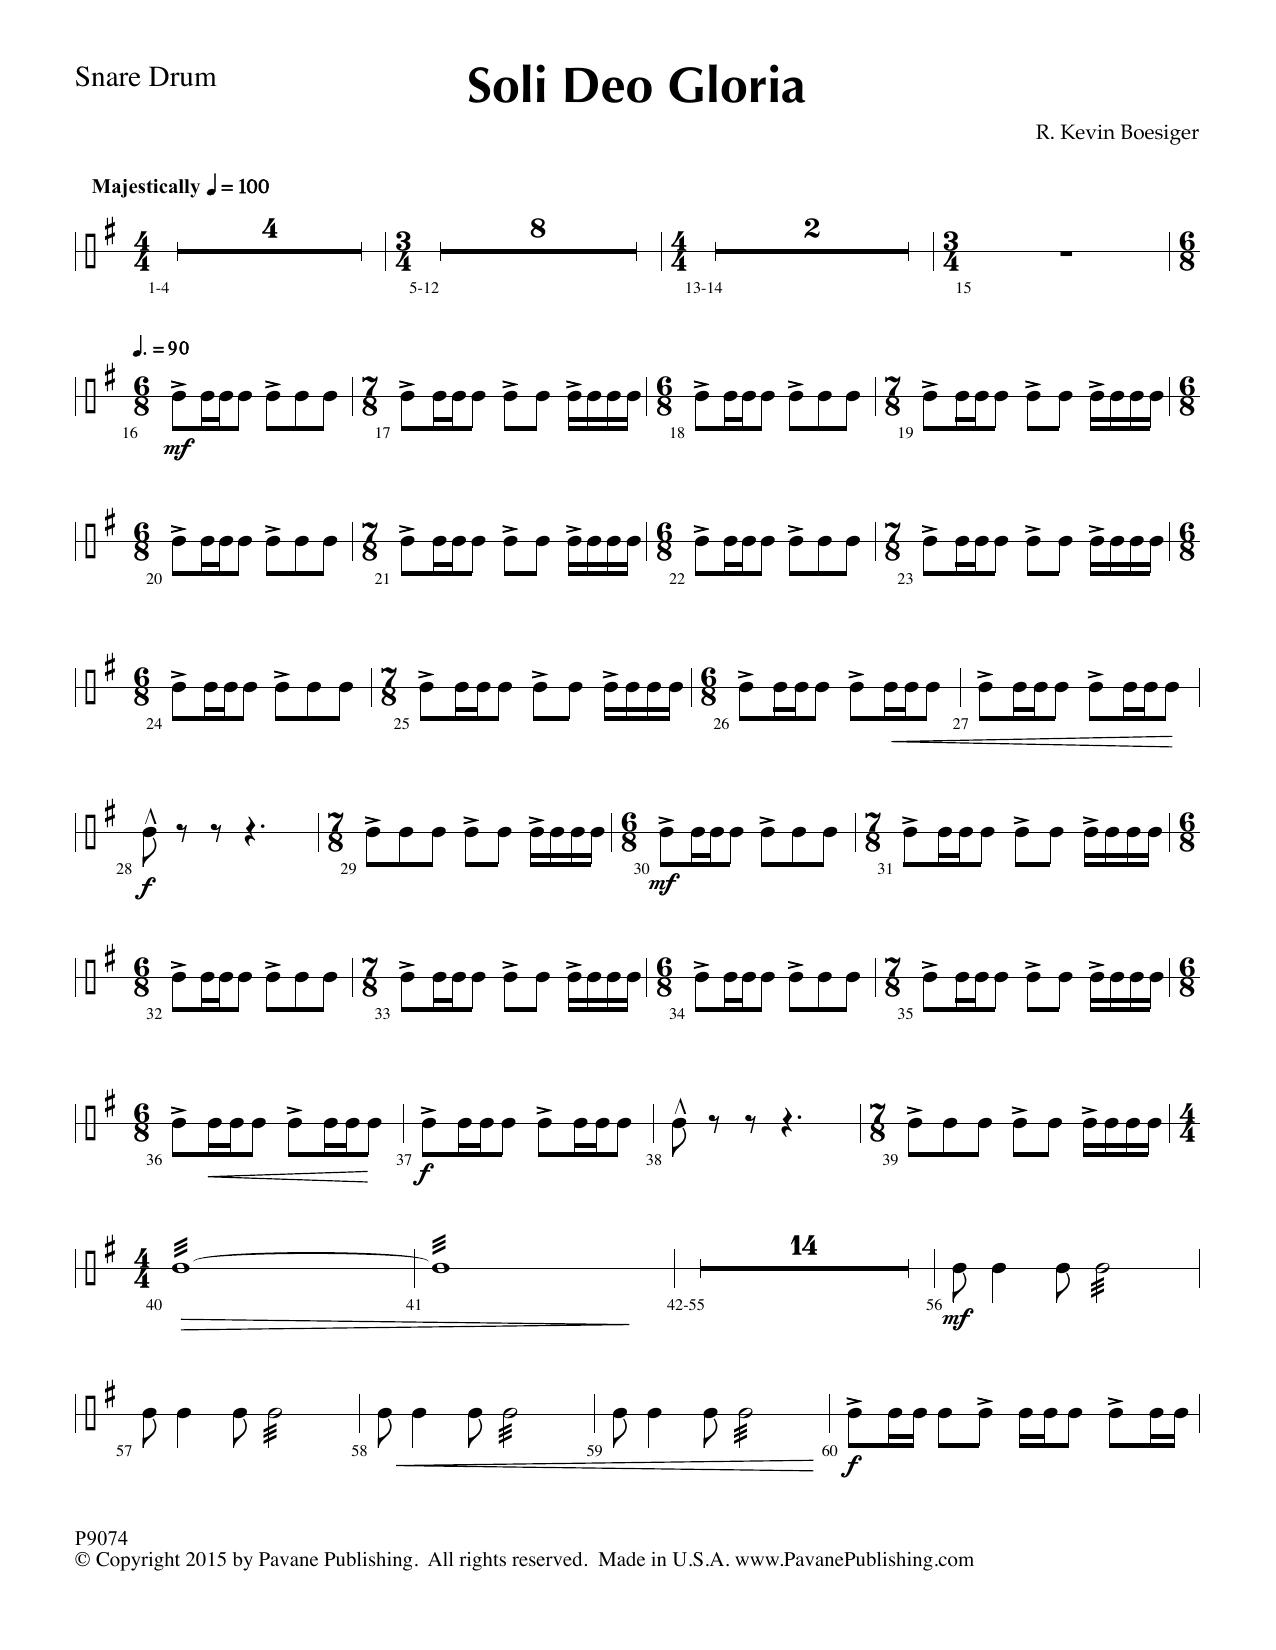 Soli Deo Gloria - Snare Drum Sheet Music